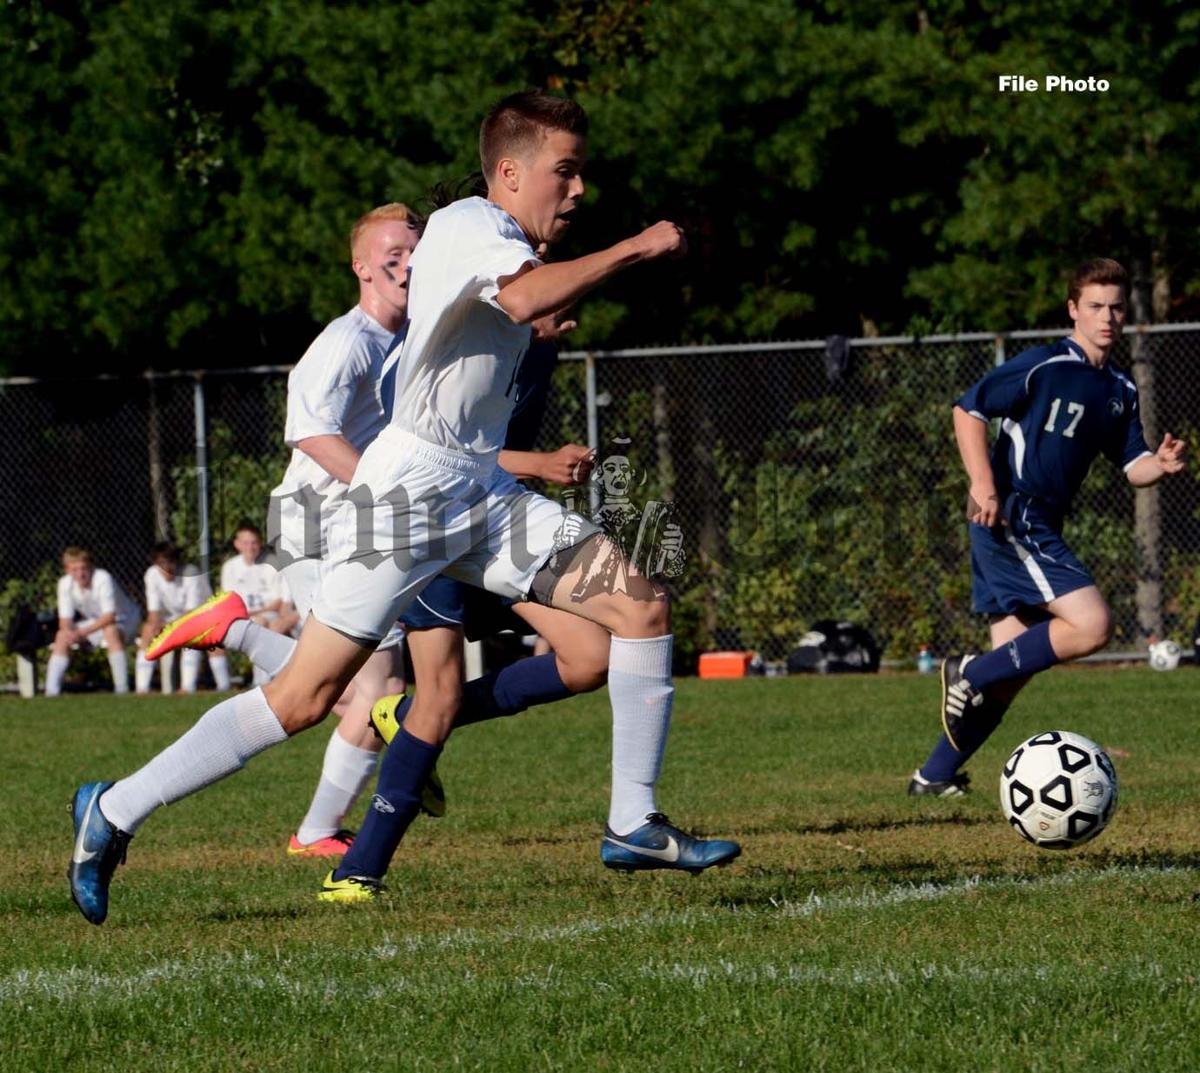 Christian Lucchesi of Shawsheen Tech Boys' Soccer All-Decade team